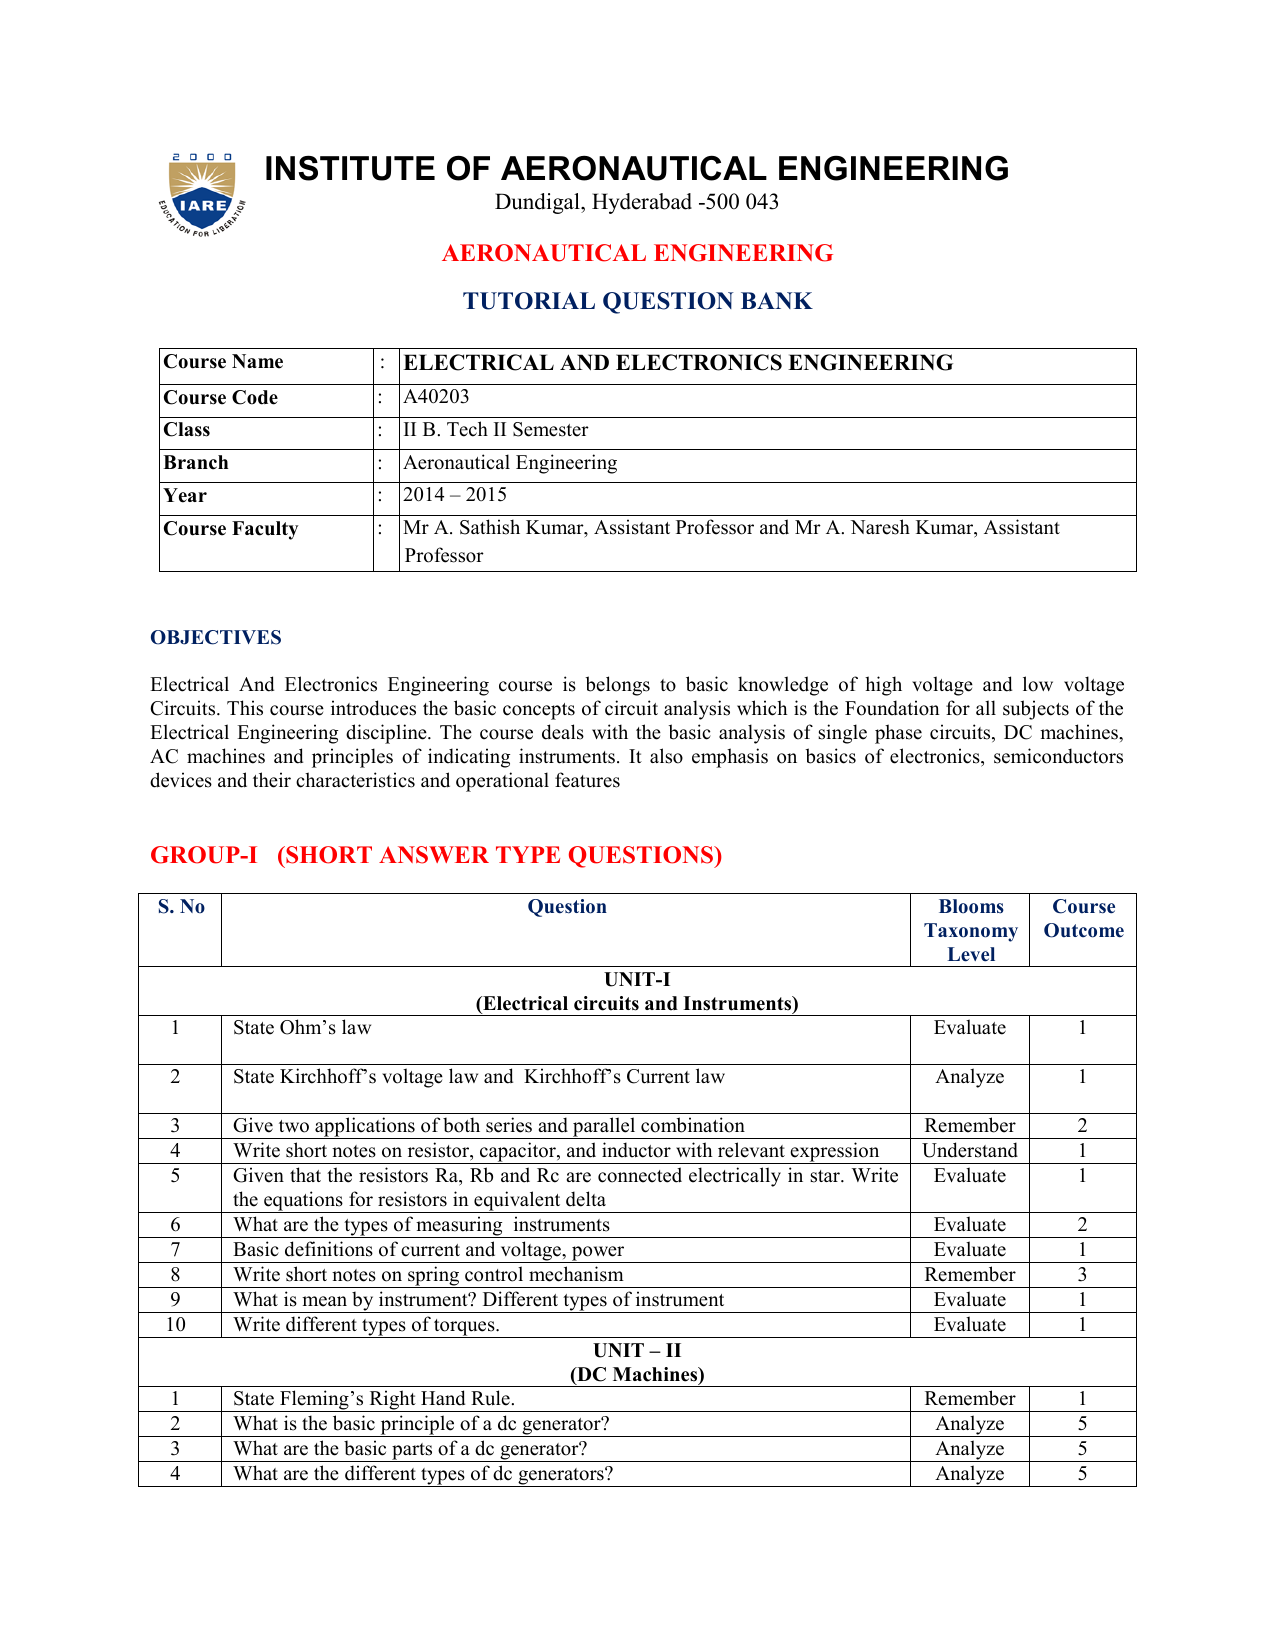 Tutorial Question Bank Electrical Engineering Tutorials Series Rlc Circuits 018829693 1 A9fa72ec8a64226e3e726d02cb636016